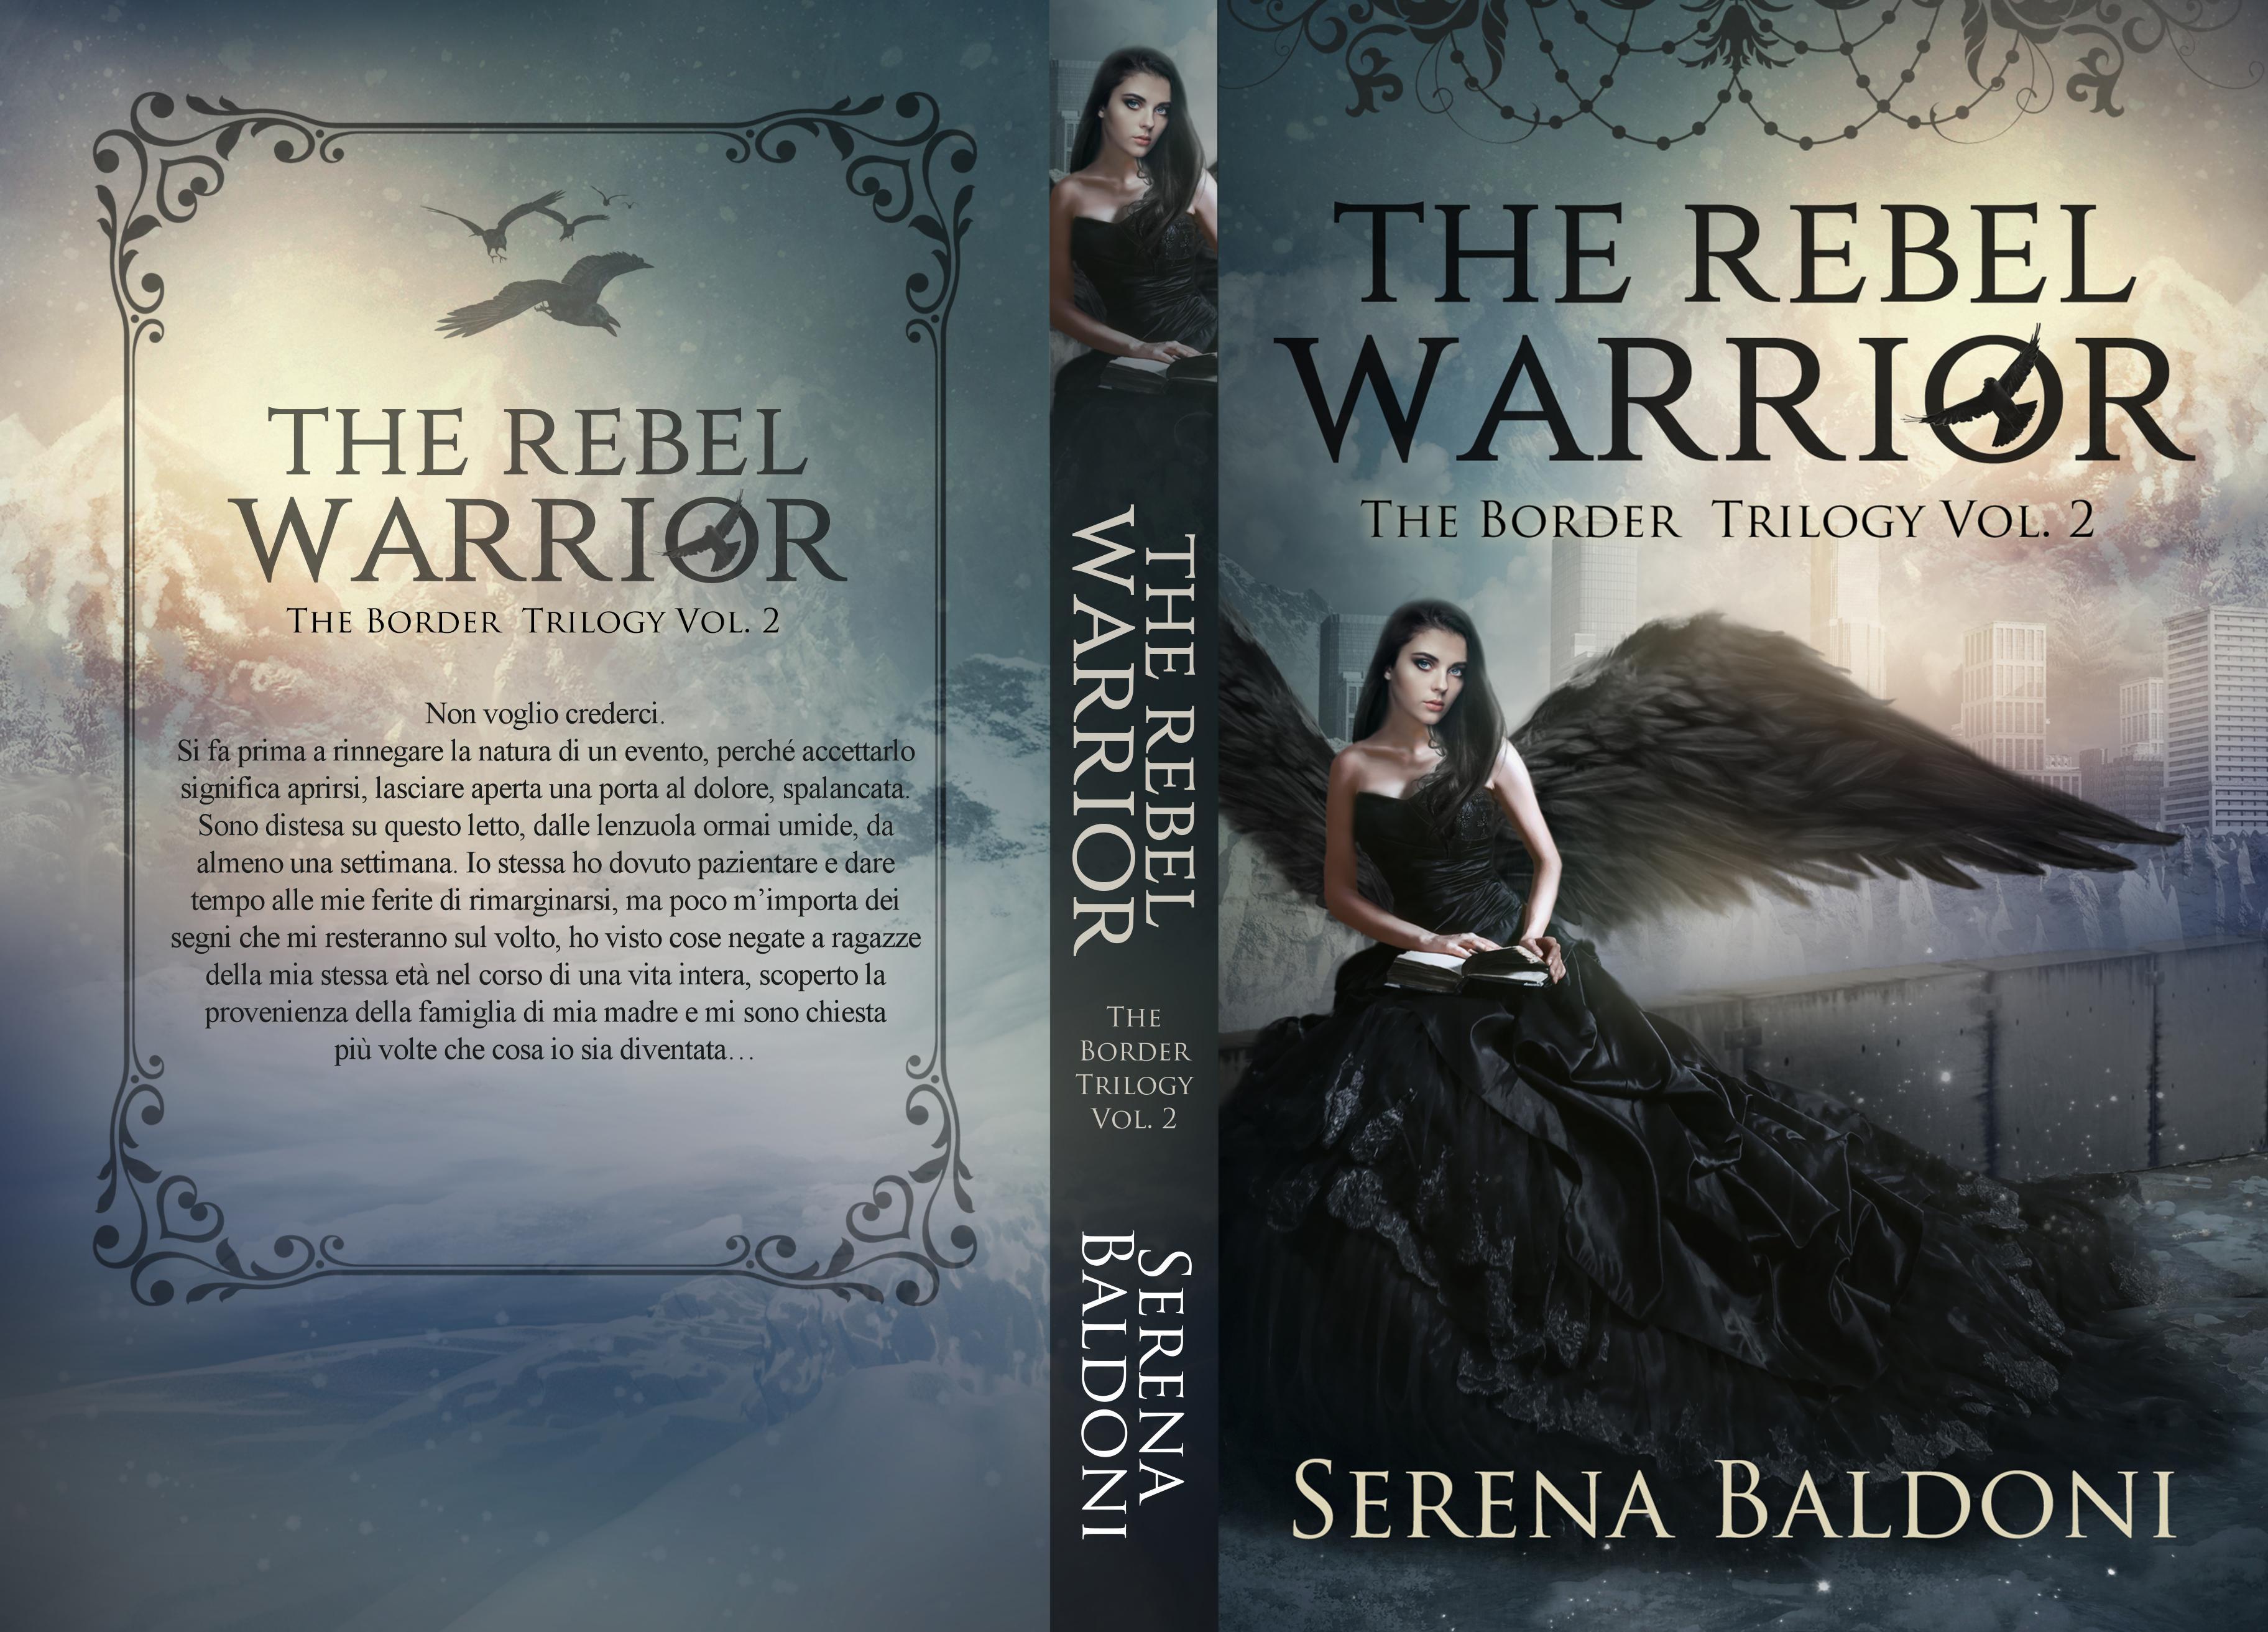 The Rebel Warrior – The Border Trilogy